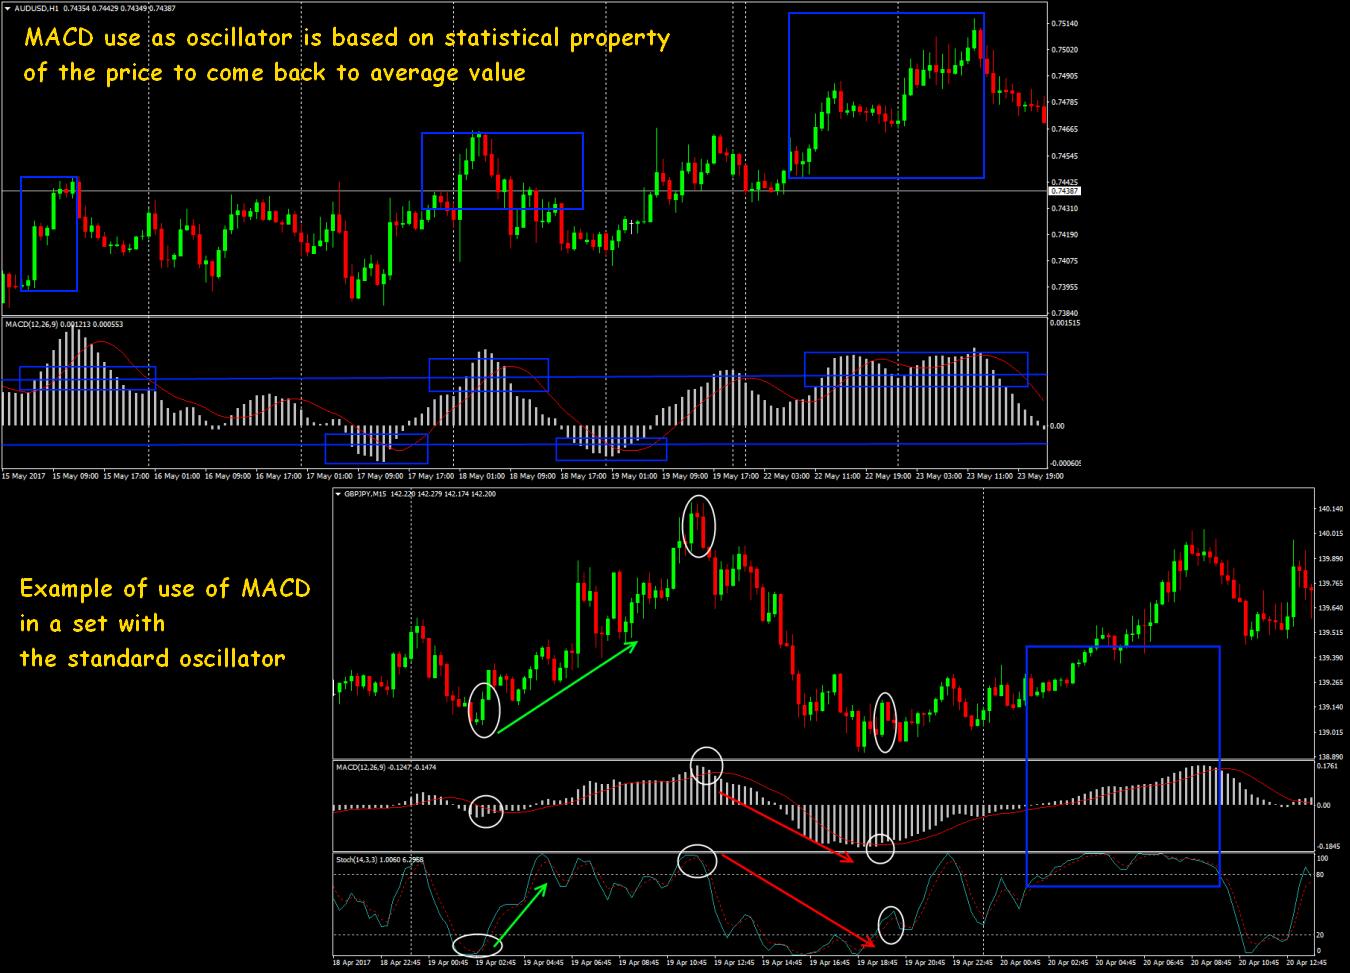 Macd trading signals